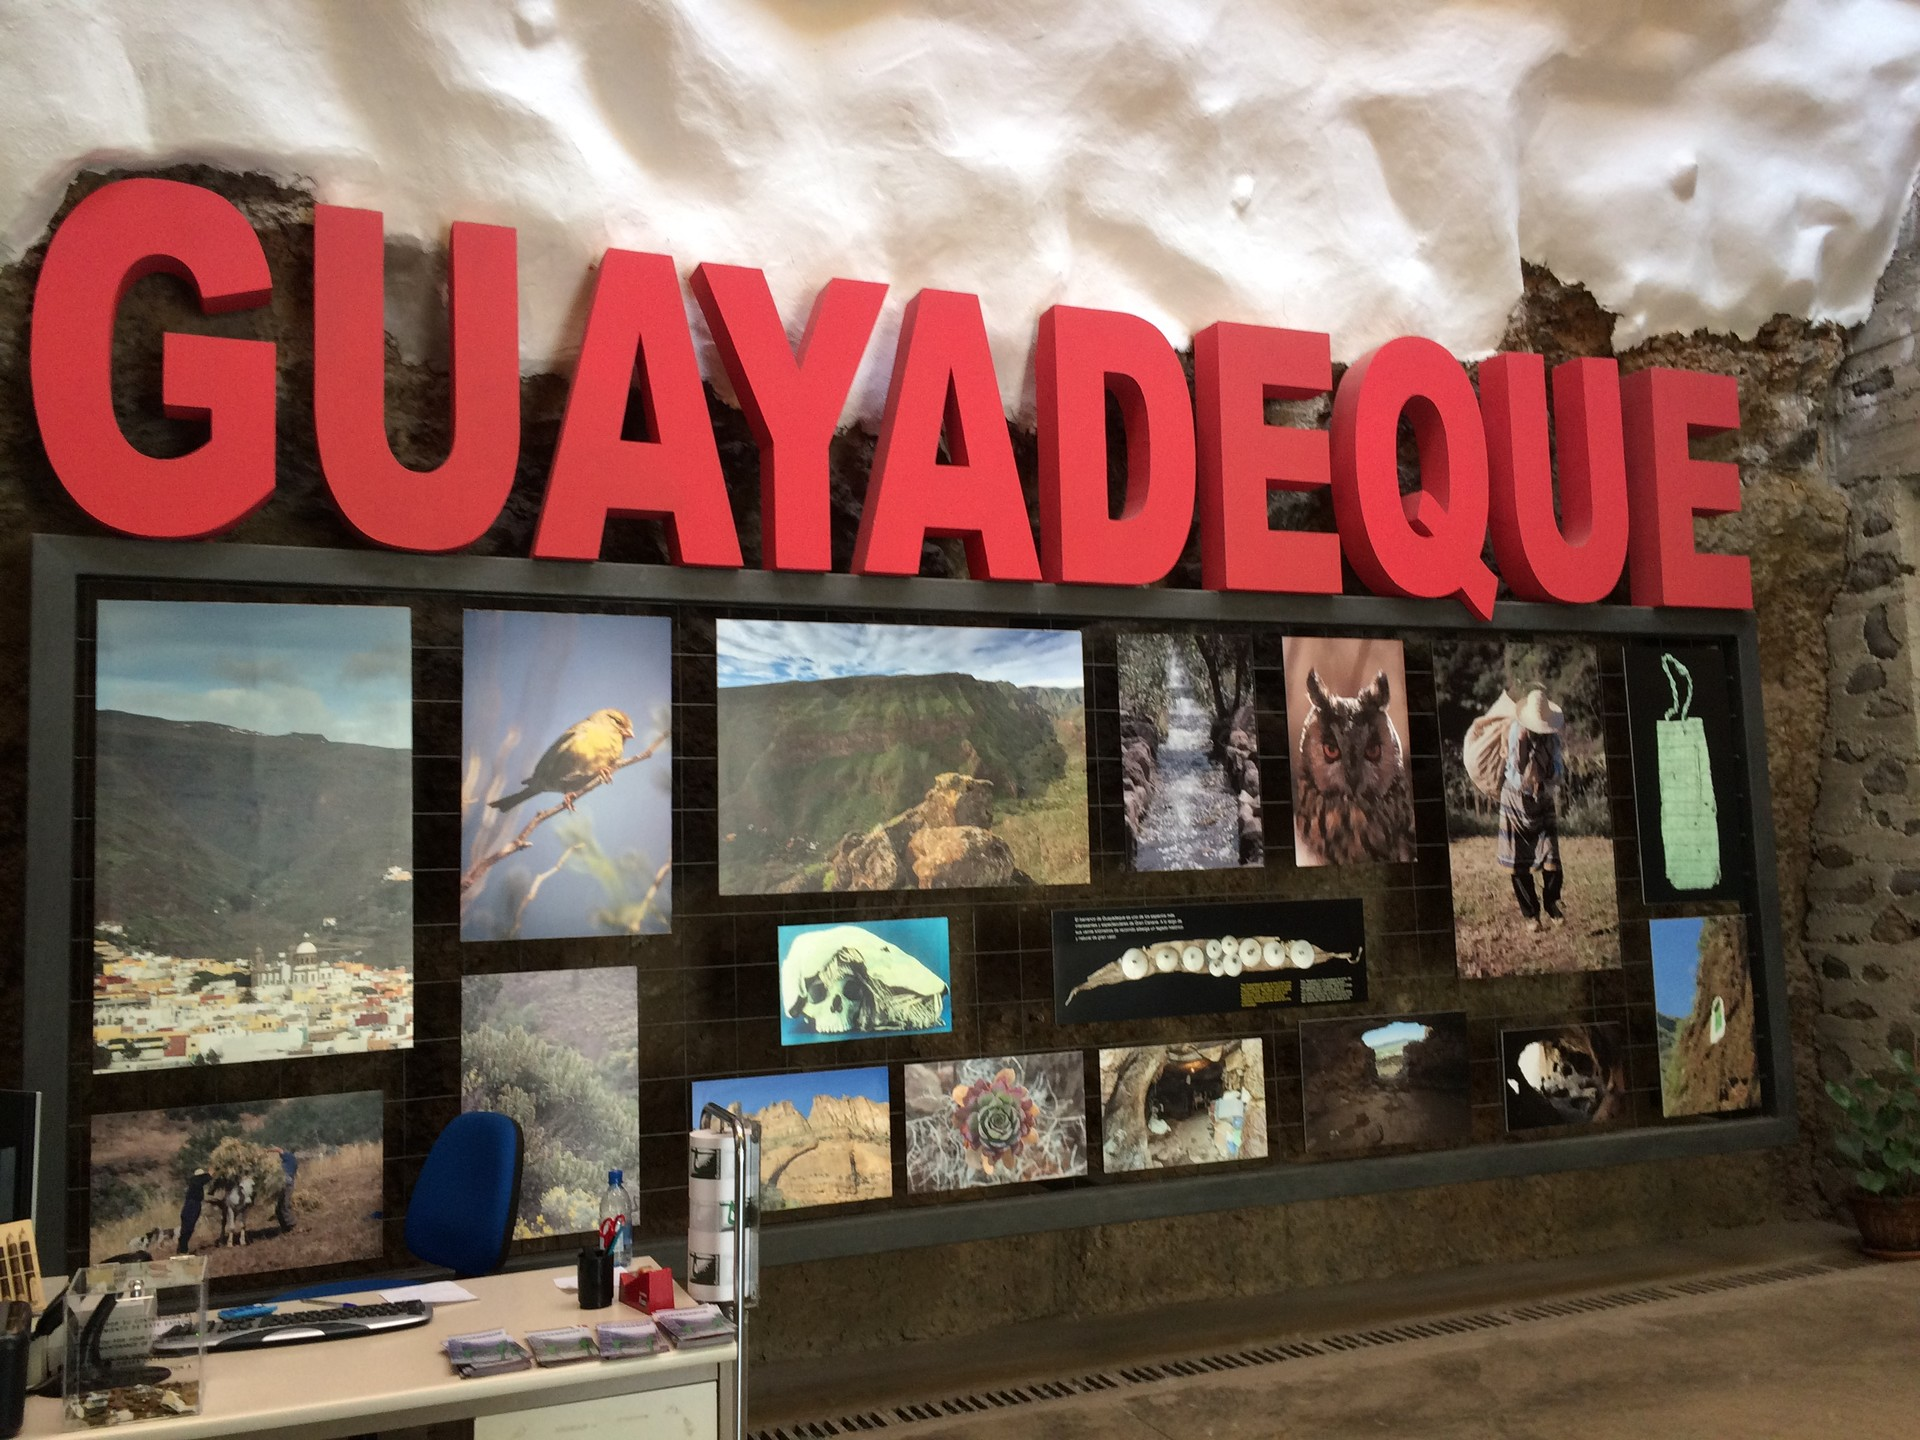 museo-guayadeque-56ff692e06df39a5ea1da50